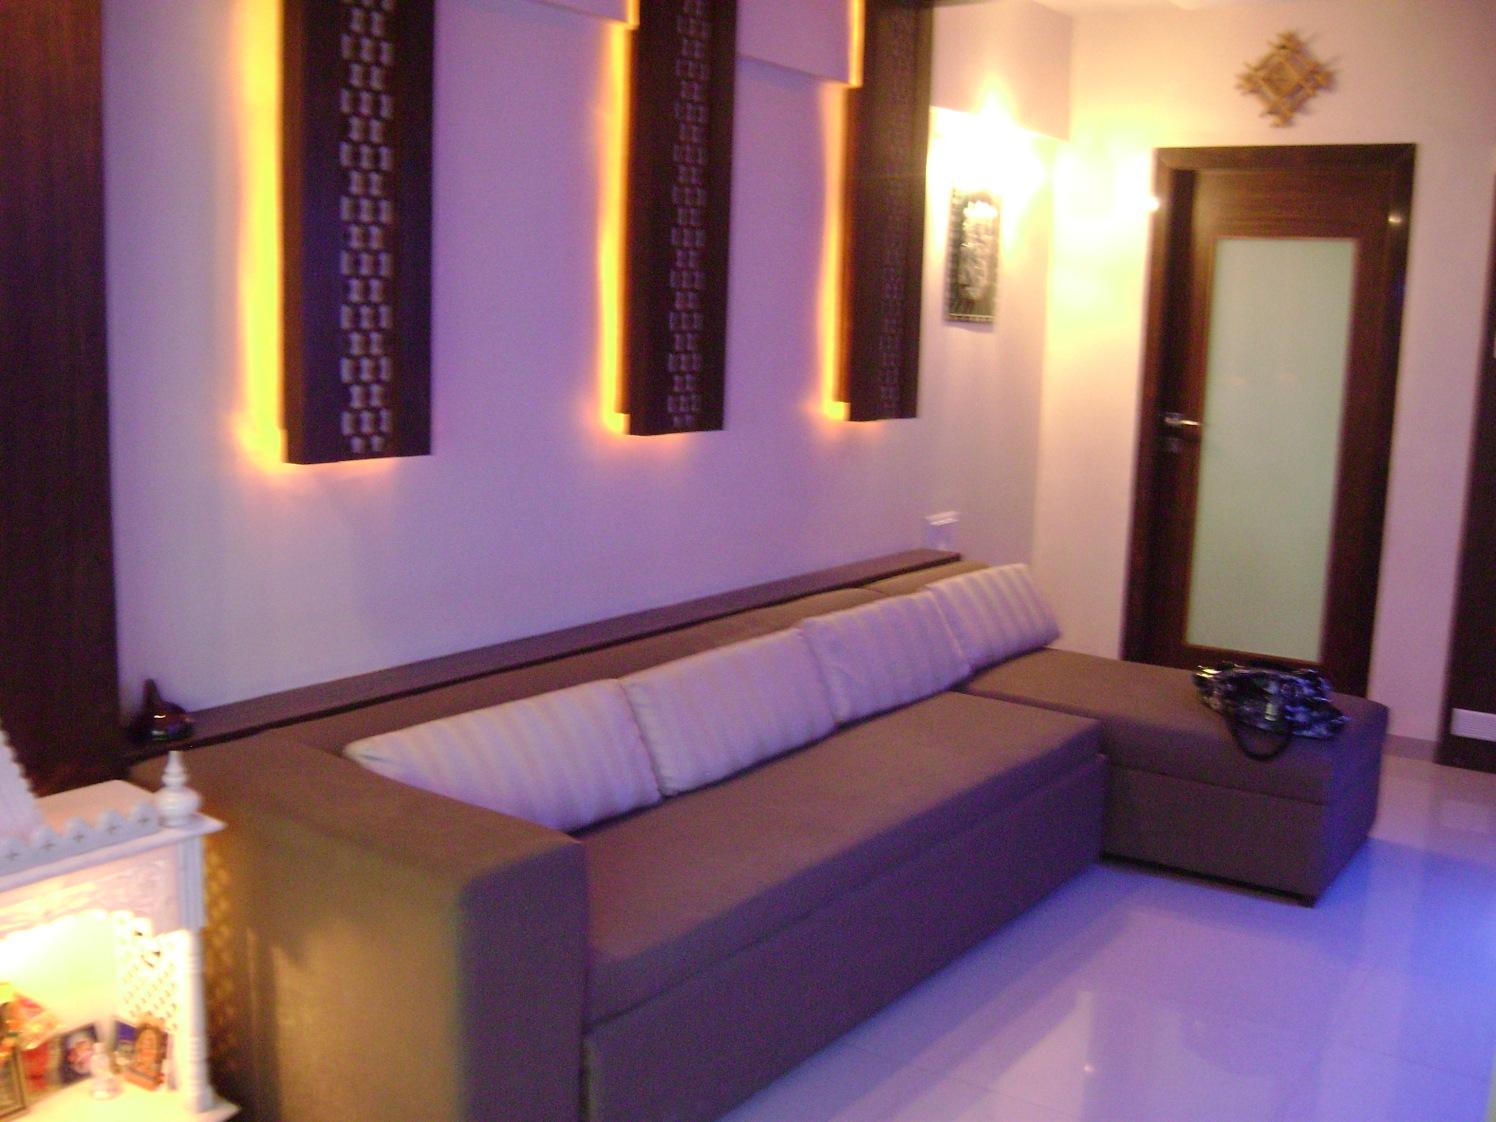 Evening Refreshness by Plus One Interiors Modern | Interior Design Photos & Ideas